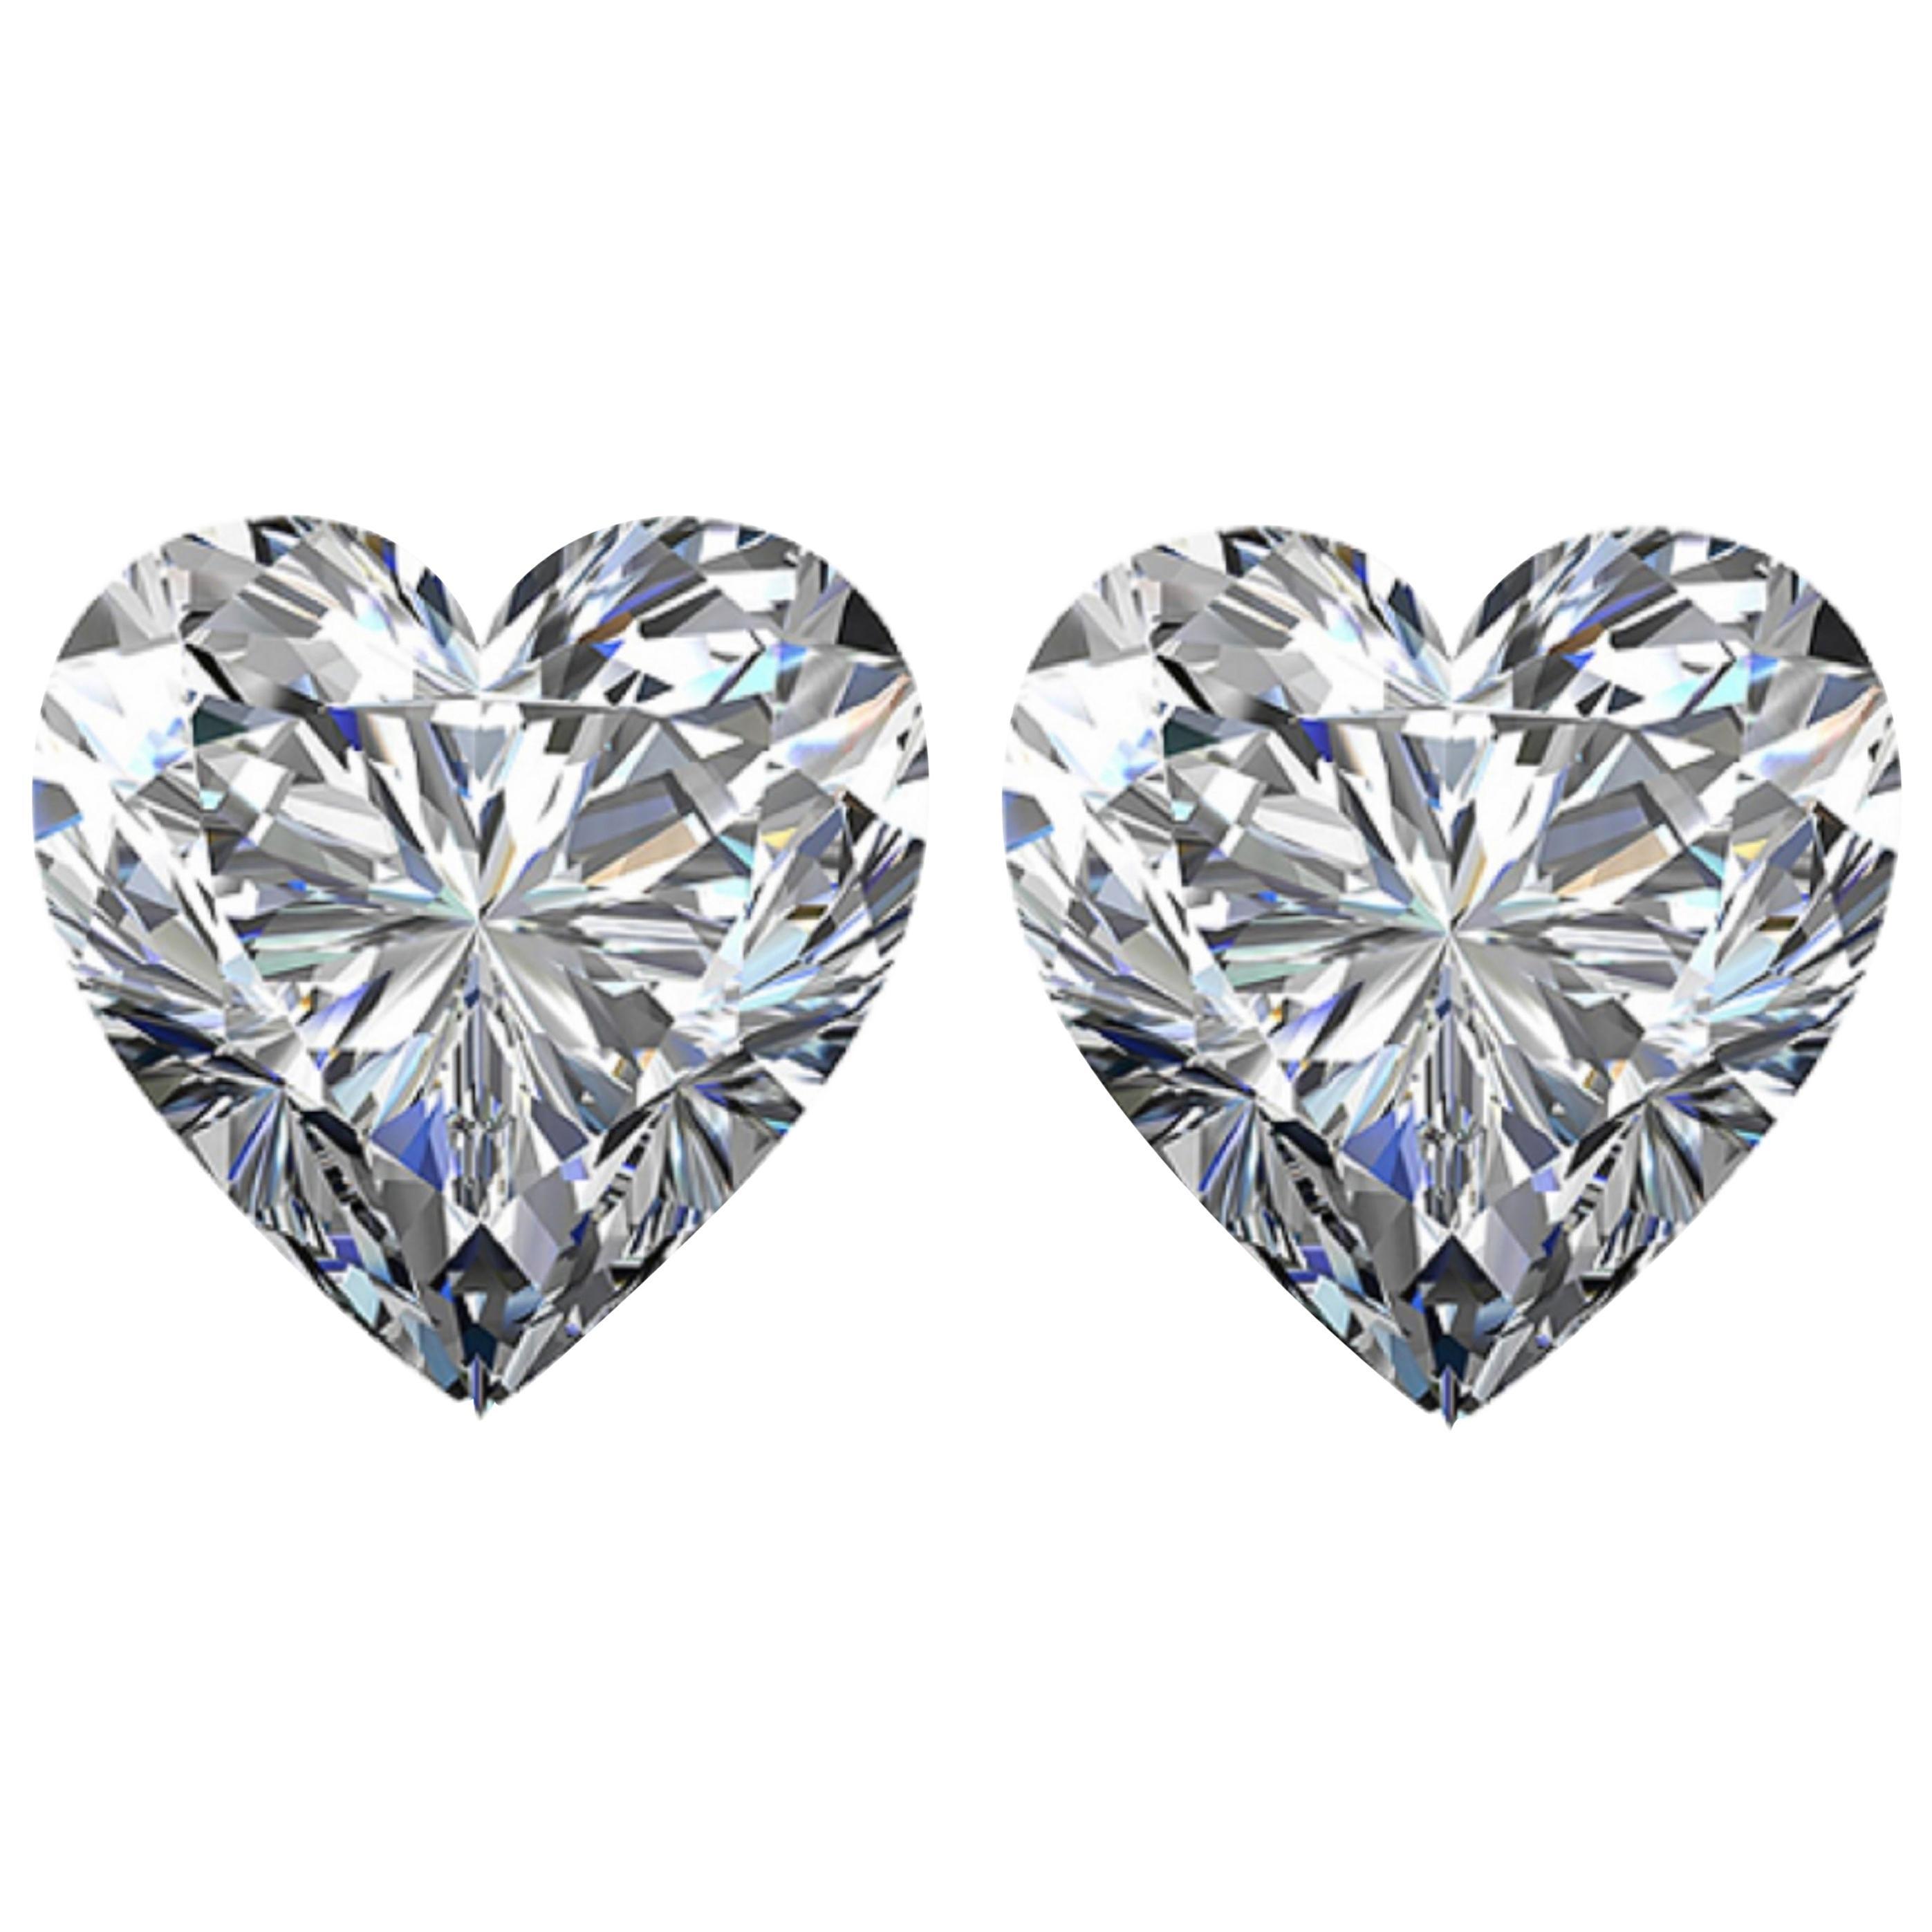 I FLAWLESS/ VVS GIA Certified 4 Carat Heart Shape Cut Diamond Studs